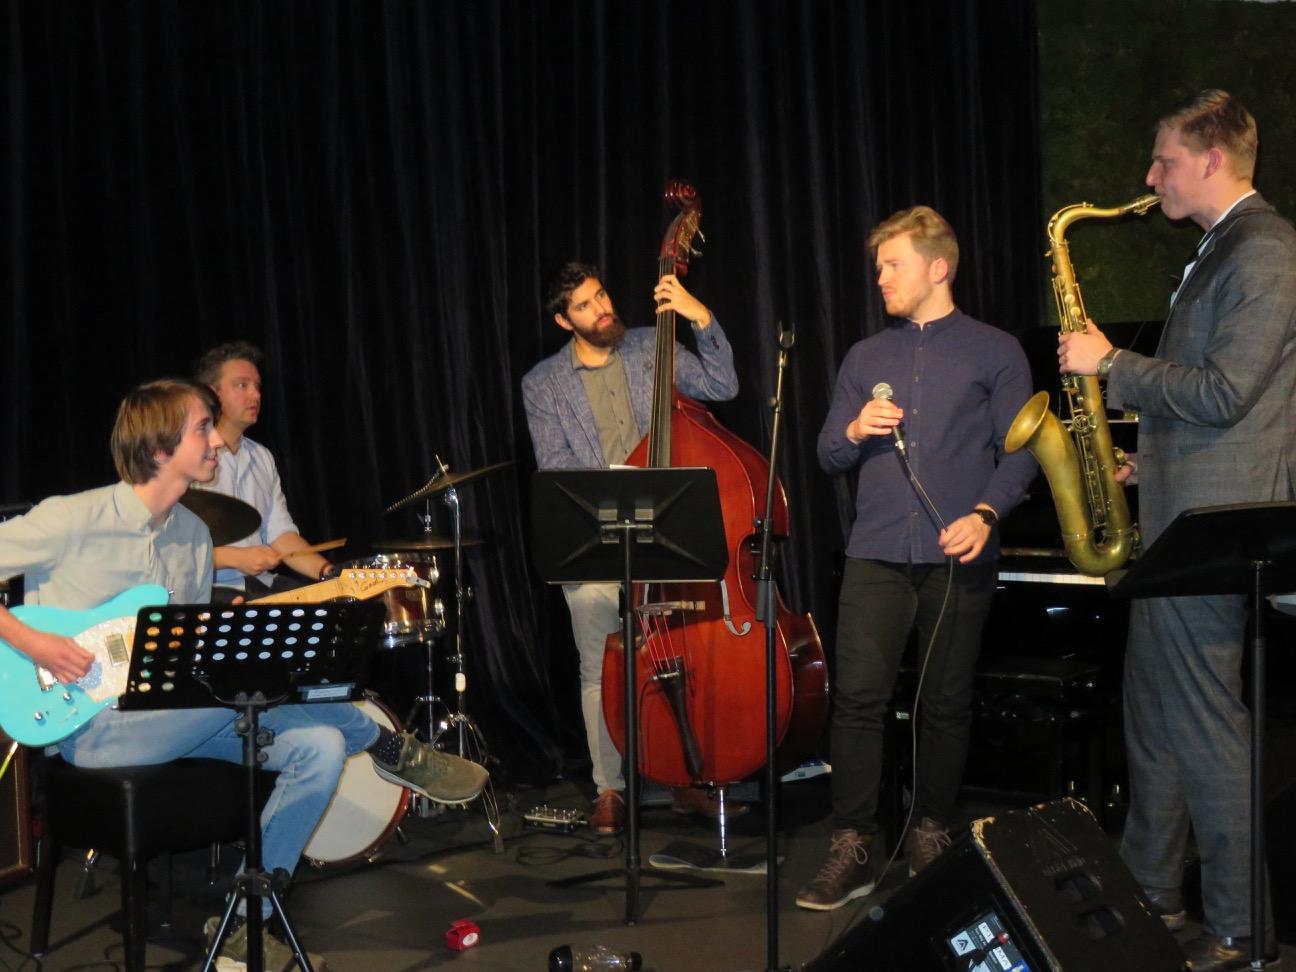 Thom Ritter Quintet 12resized